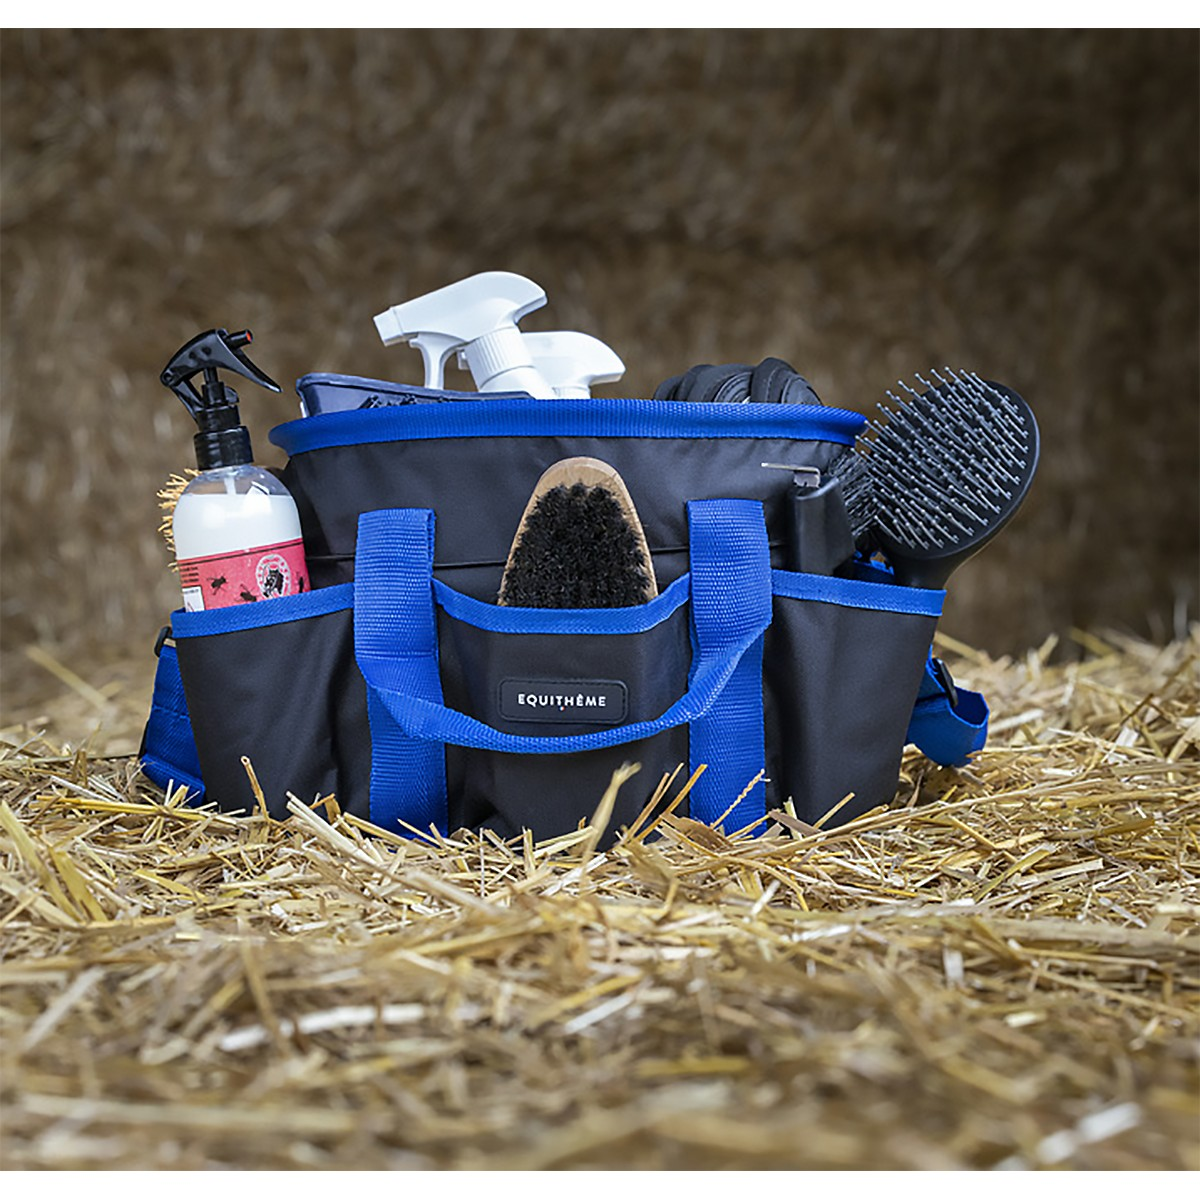 Equitheme Black & Blue Multi Pocket Grooming Kit Bag